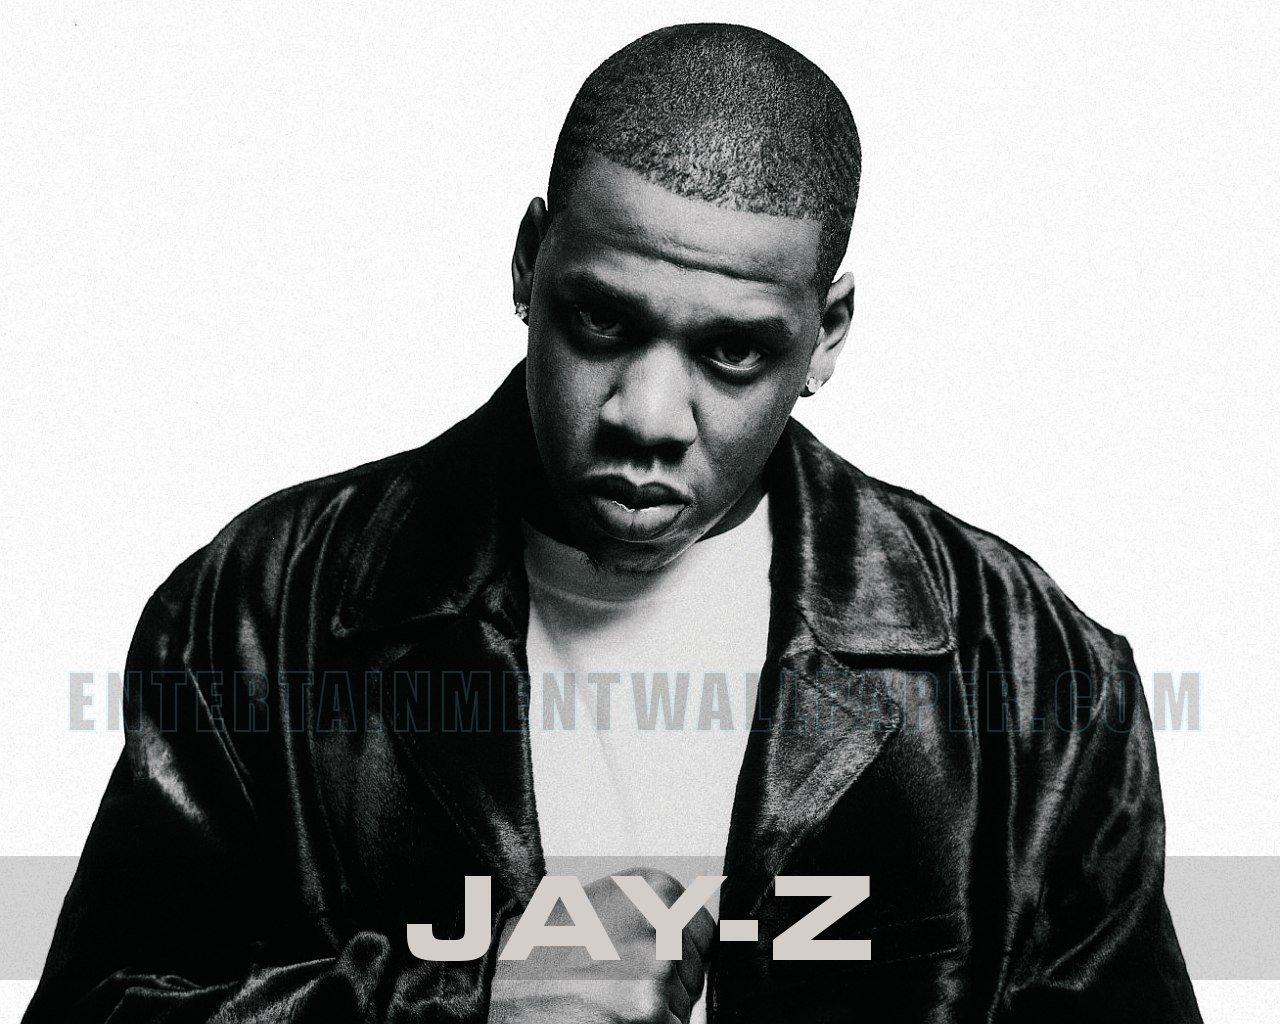 Jay-Z Elevator Assault (Extended Version)